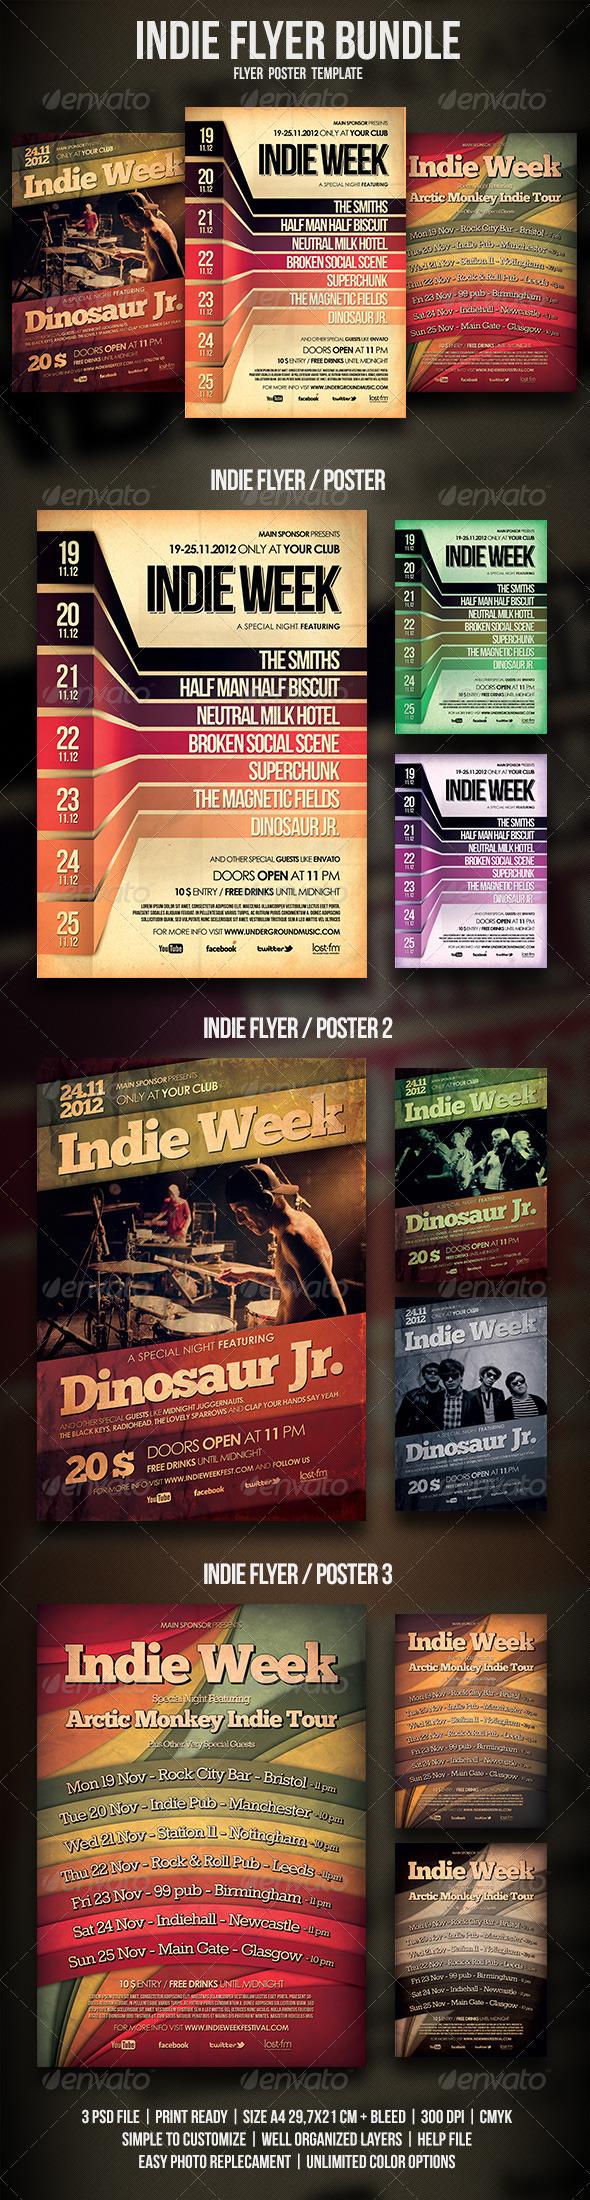 GraphicRiver Indie Flyer Poster Bundle 3521049